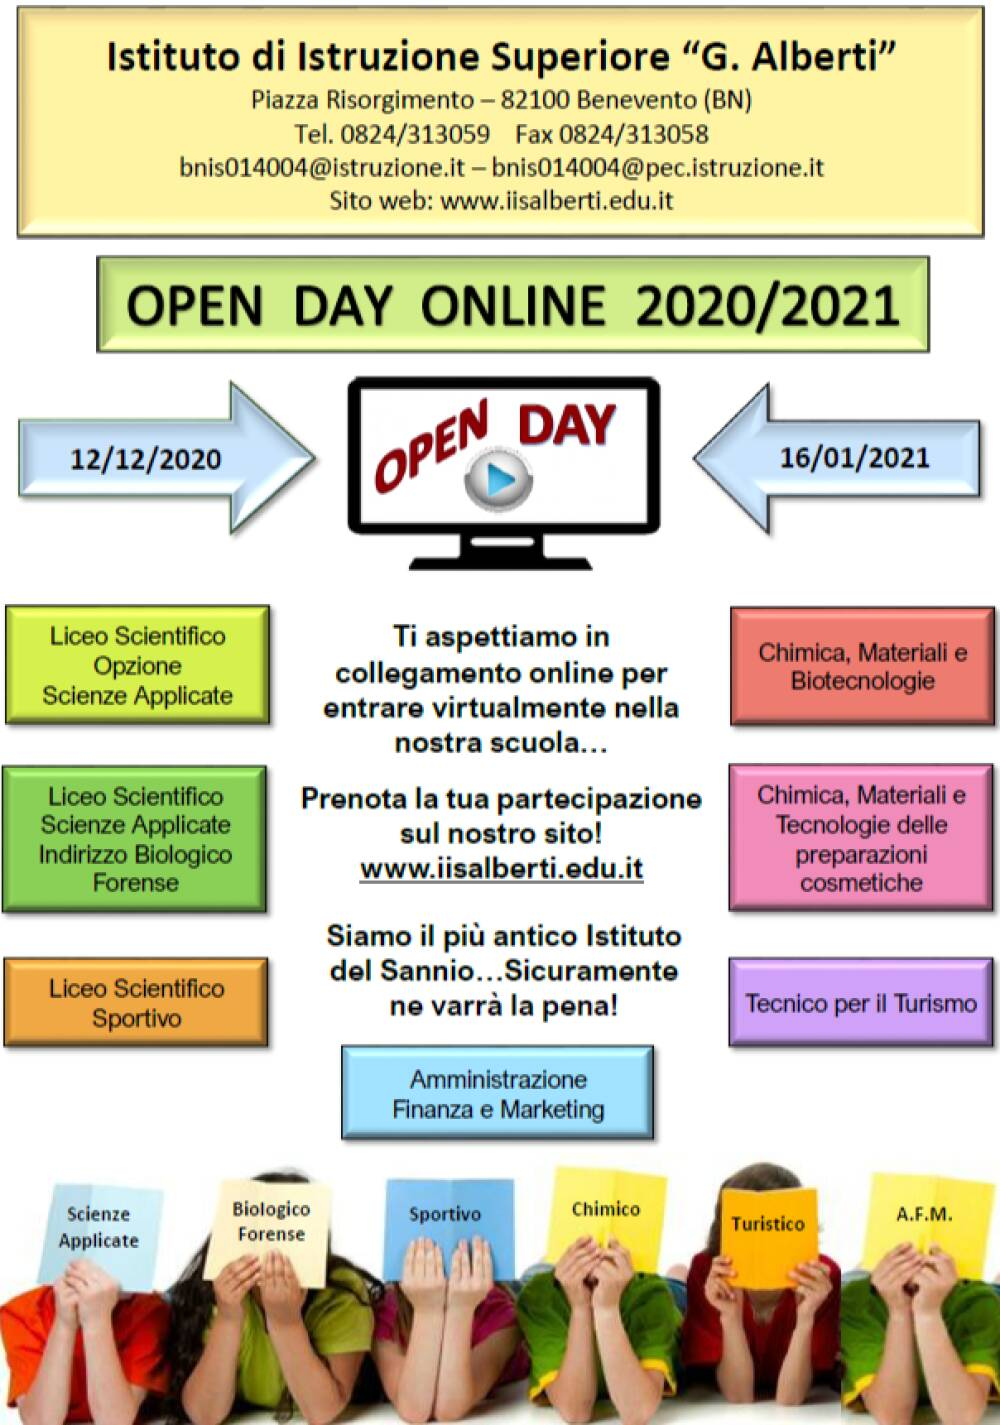 Manifesto Openday 2020